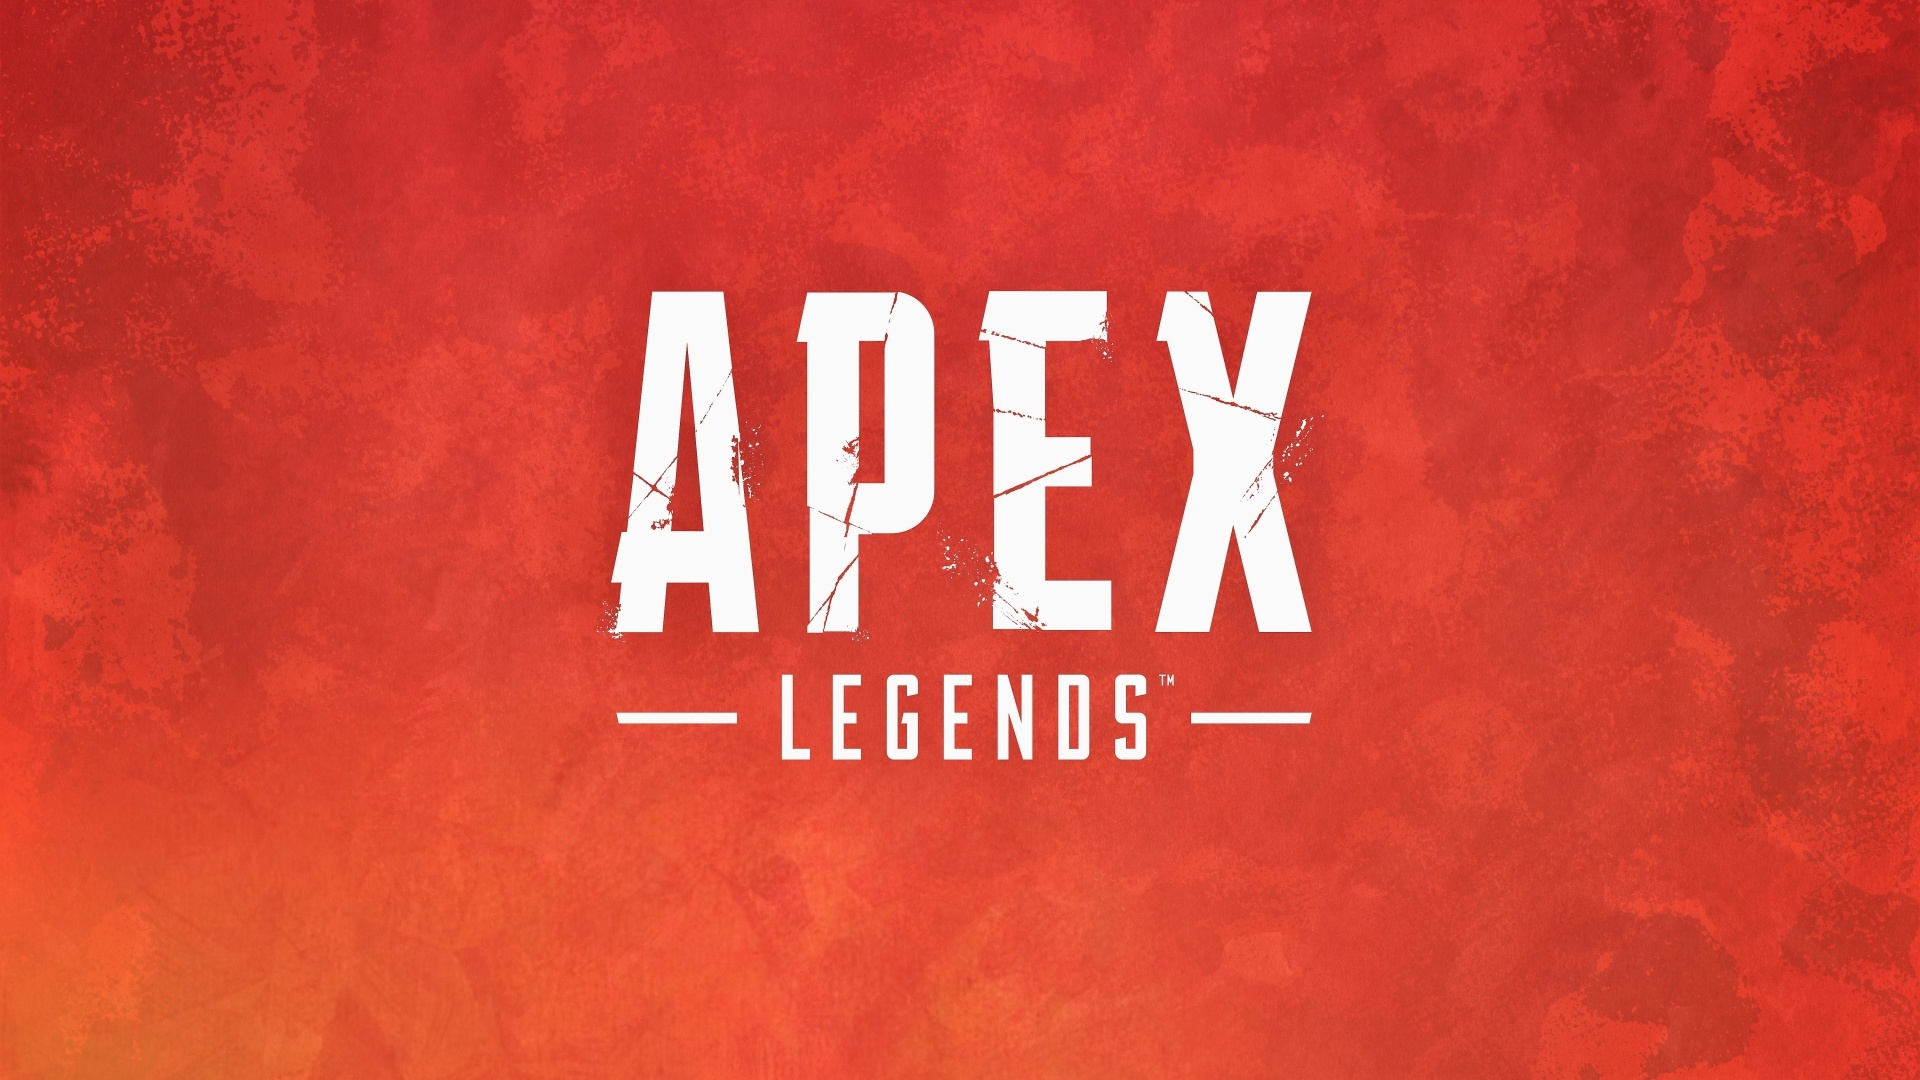 Apex Legends hd background